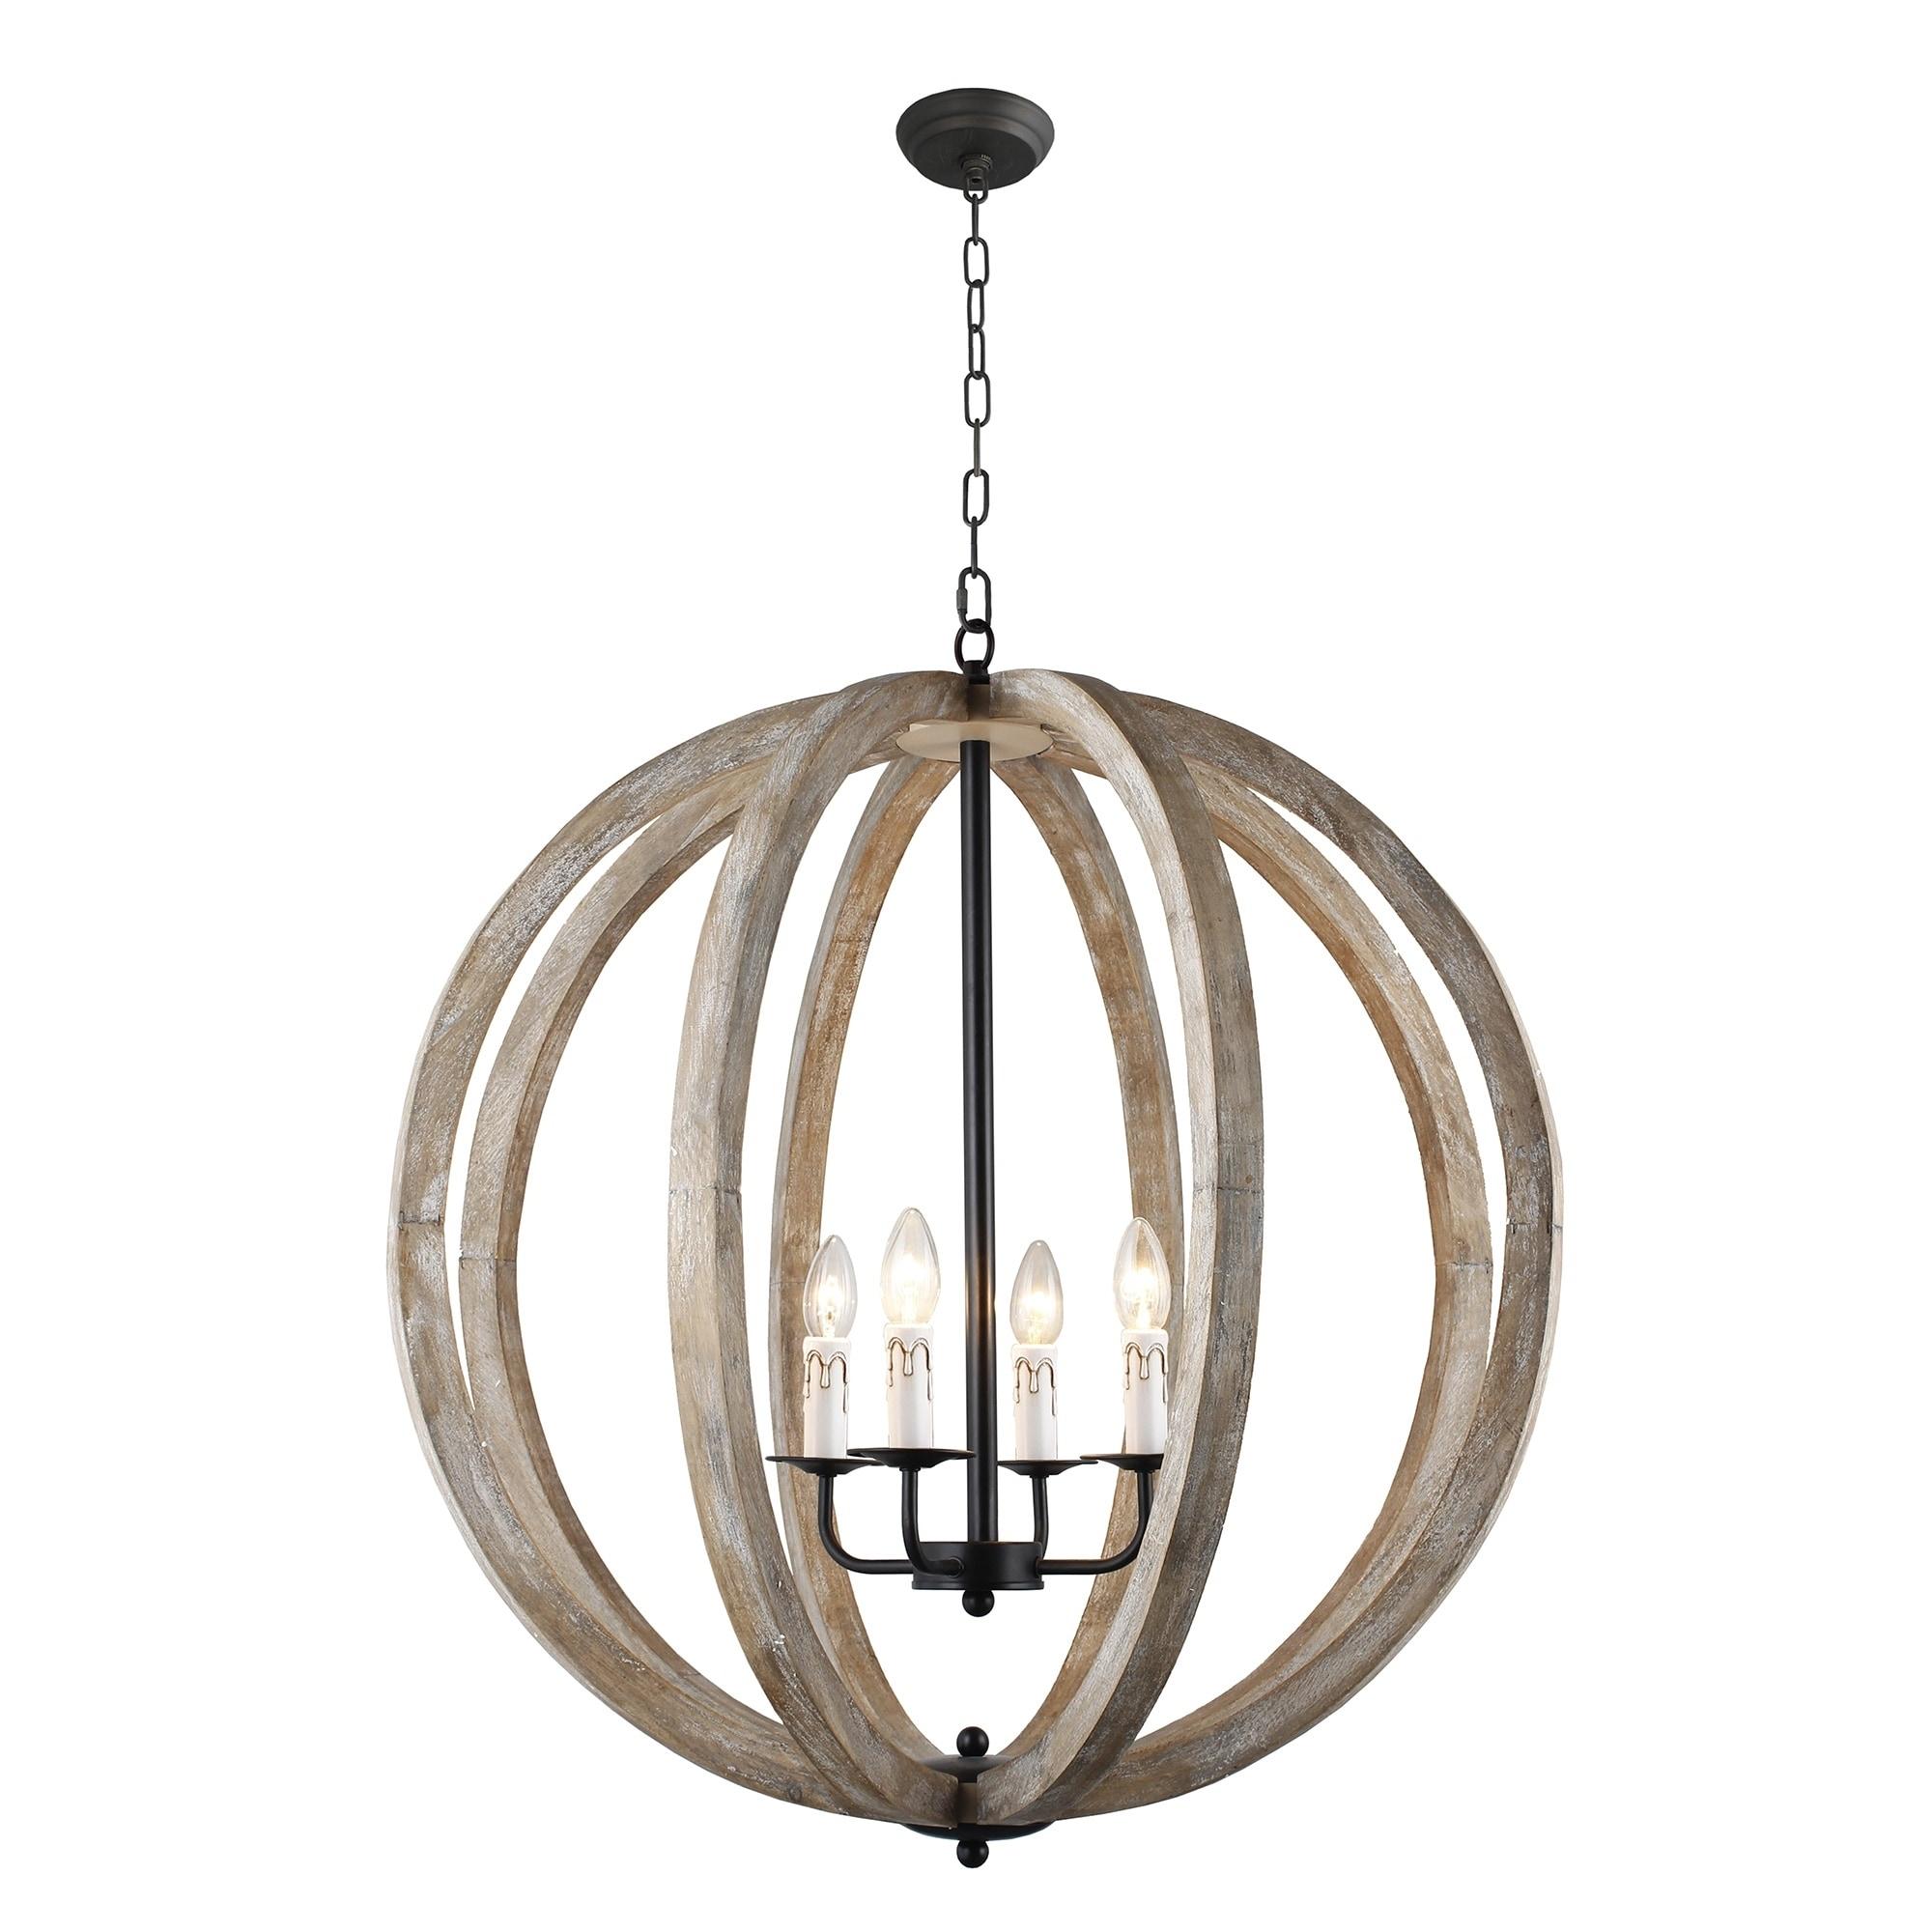 Y Decor Capoli 4 Light Wooden Orb